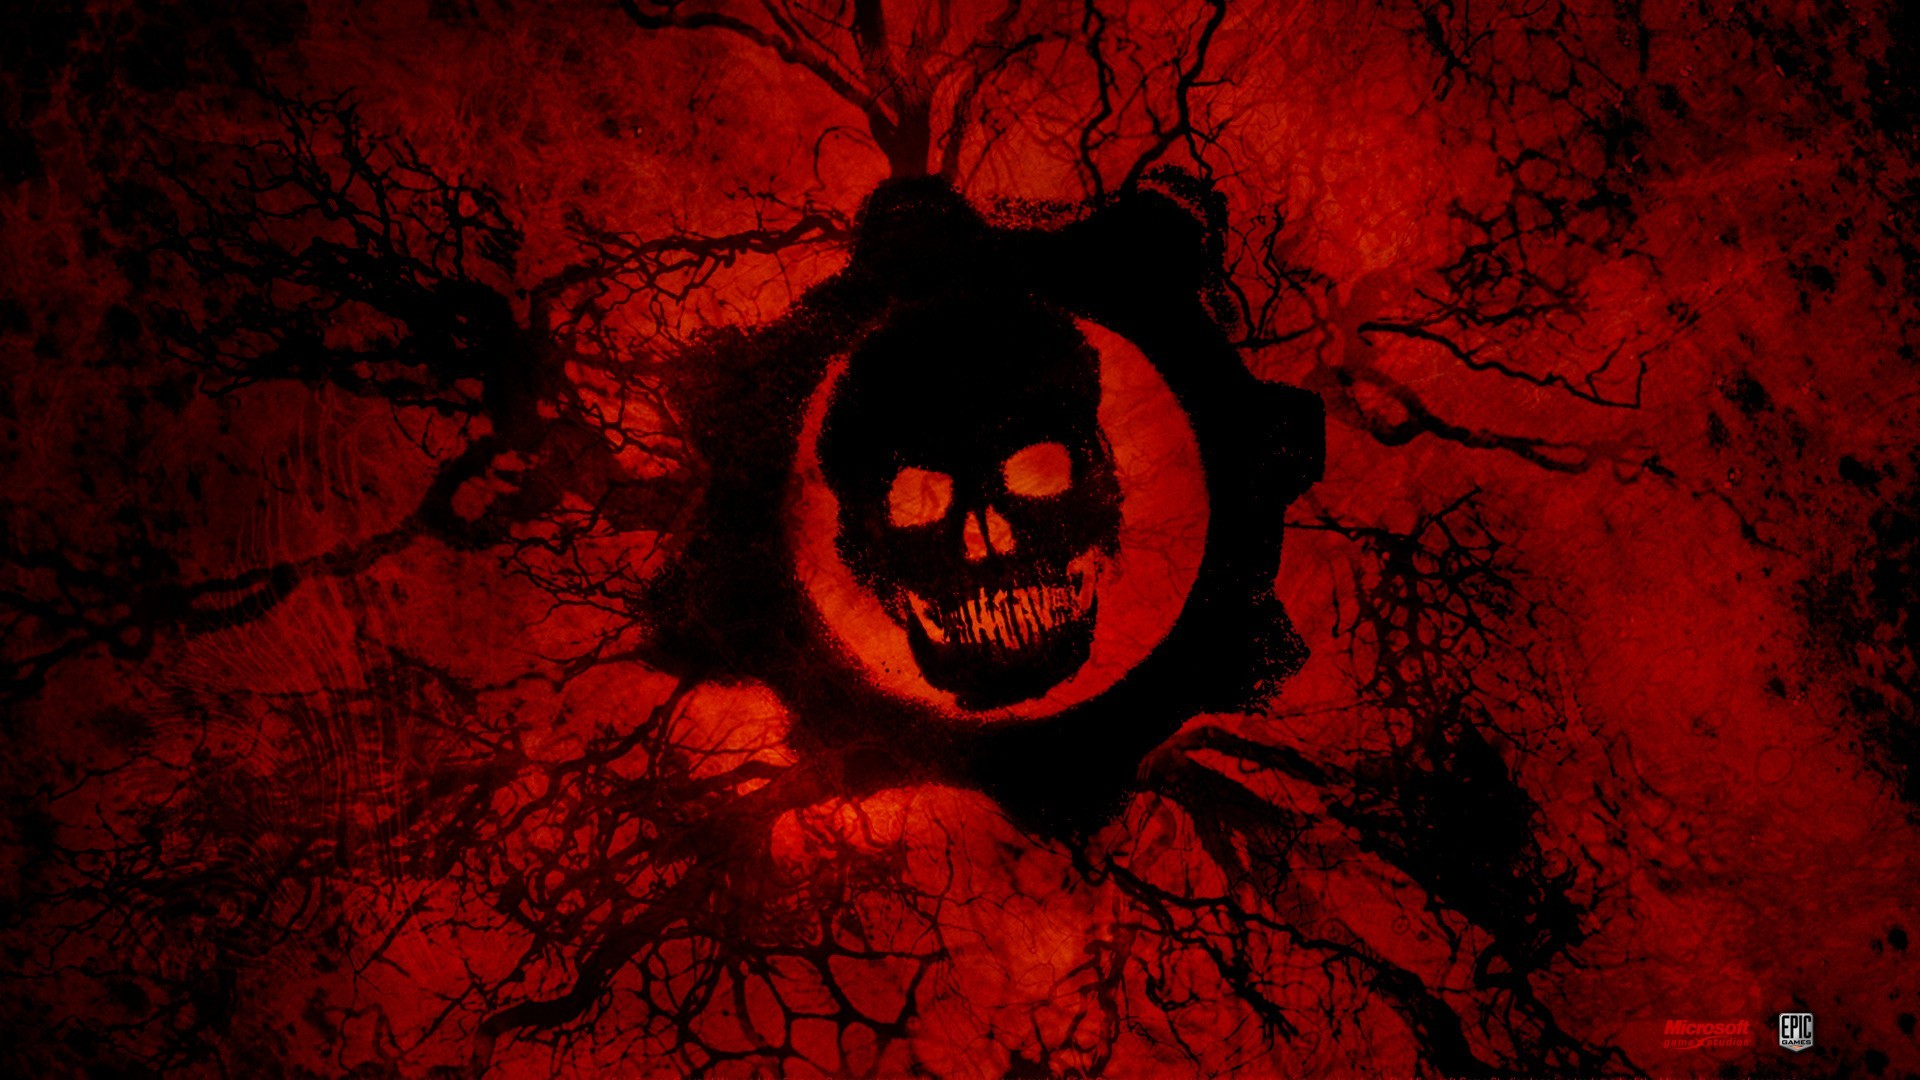 Hd Red Wallpaper